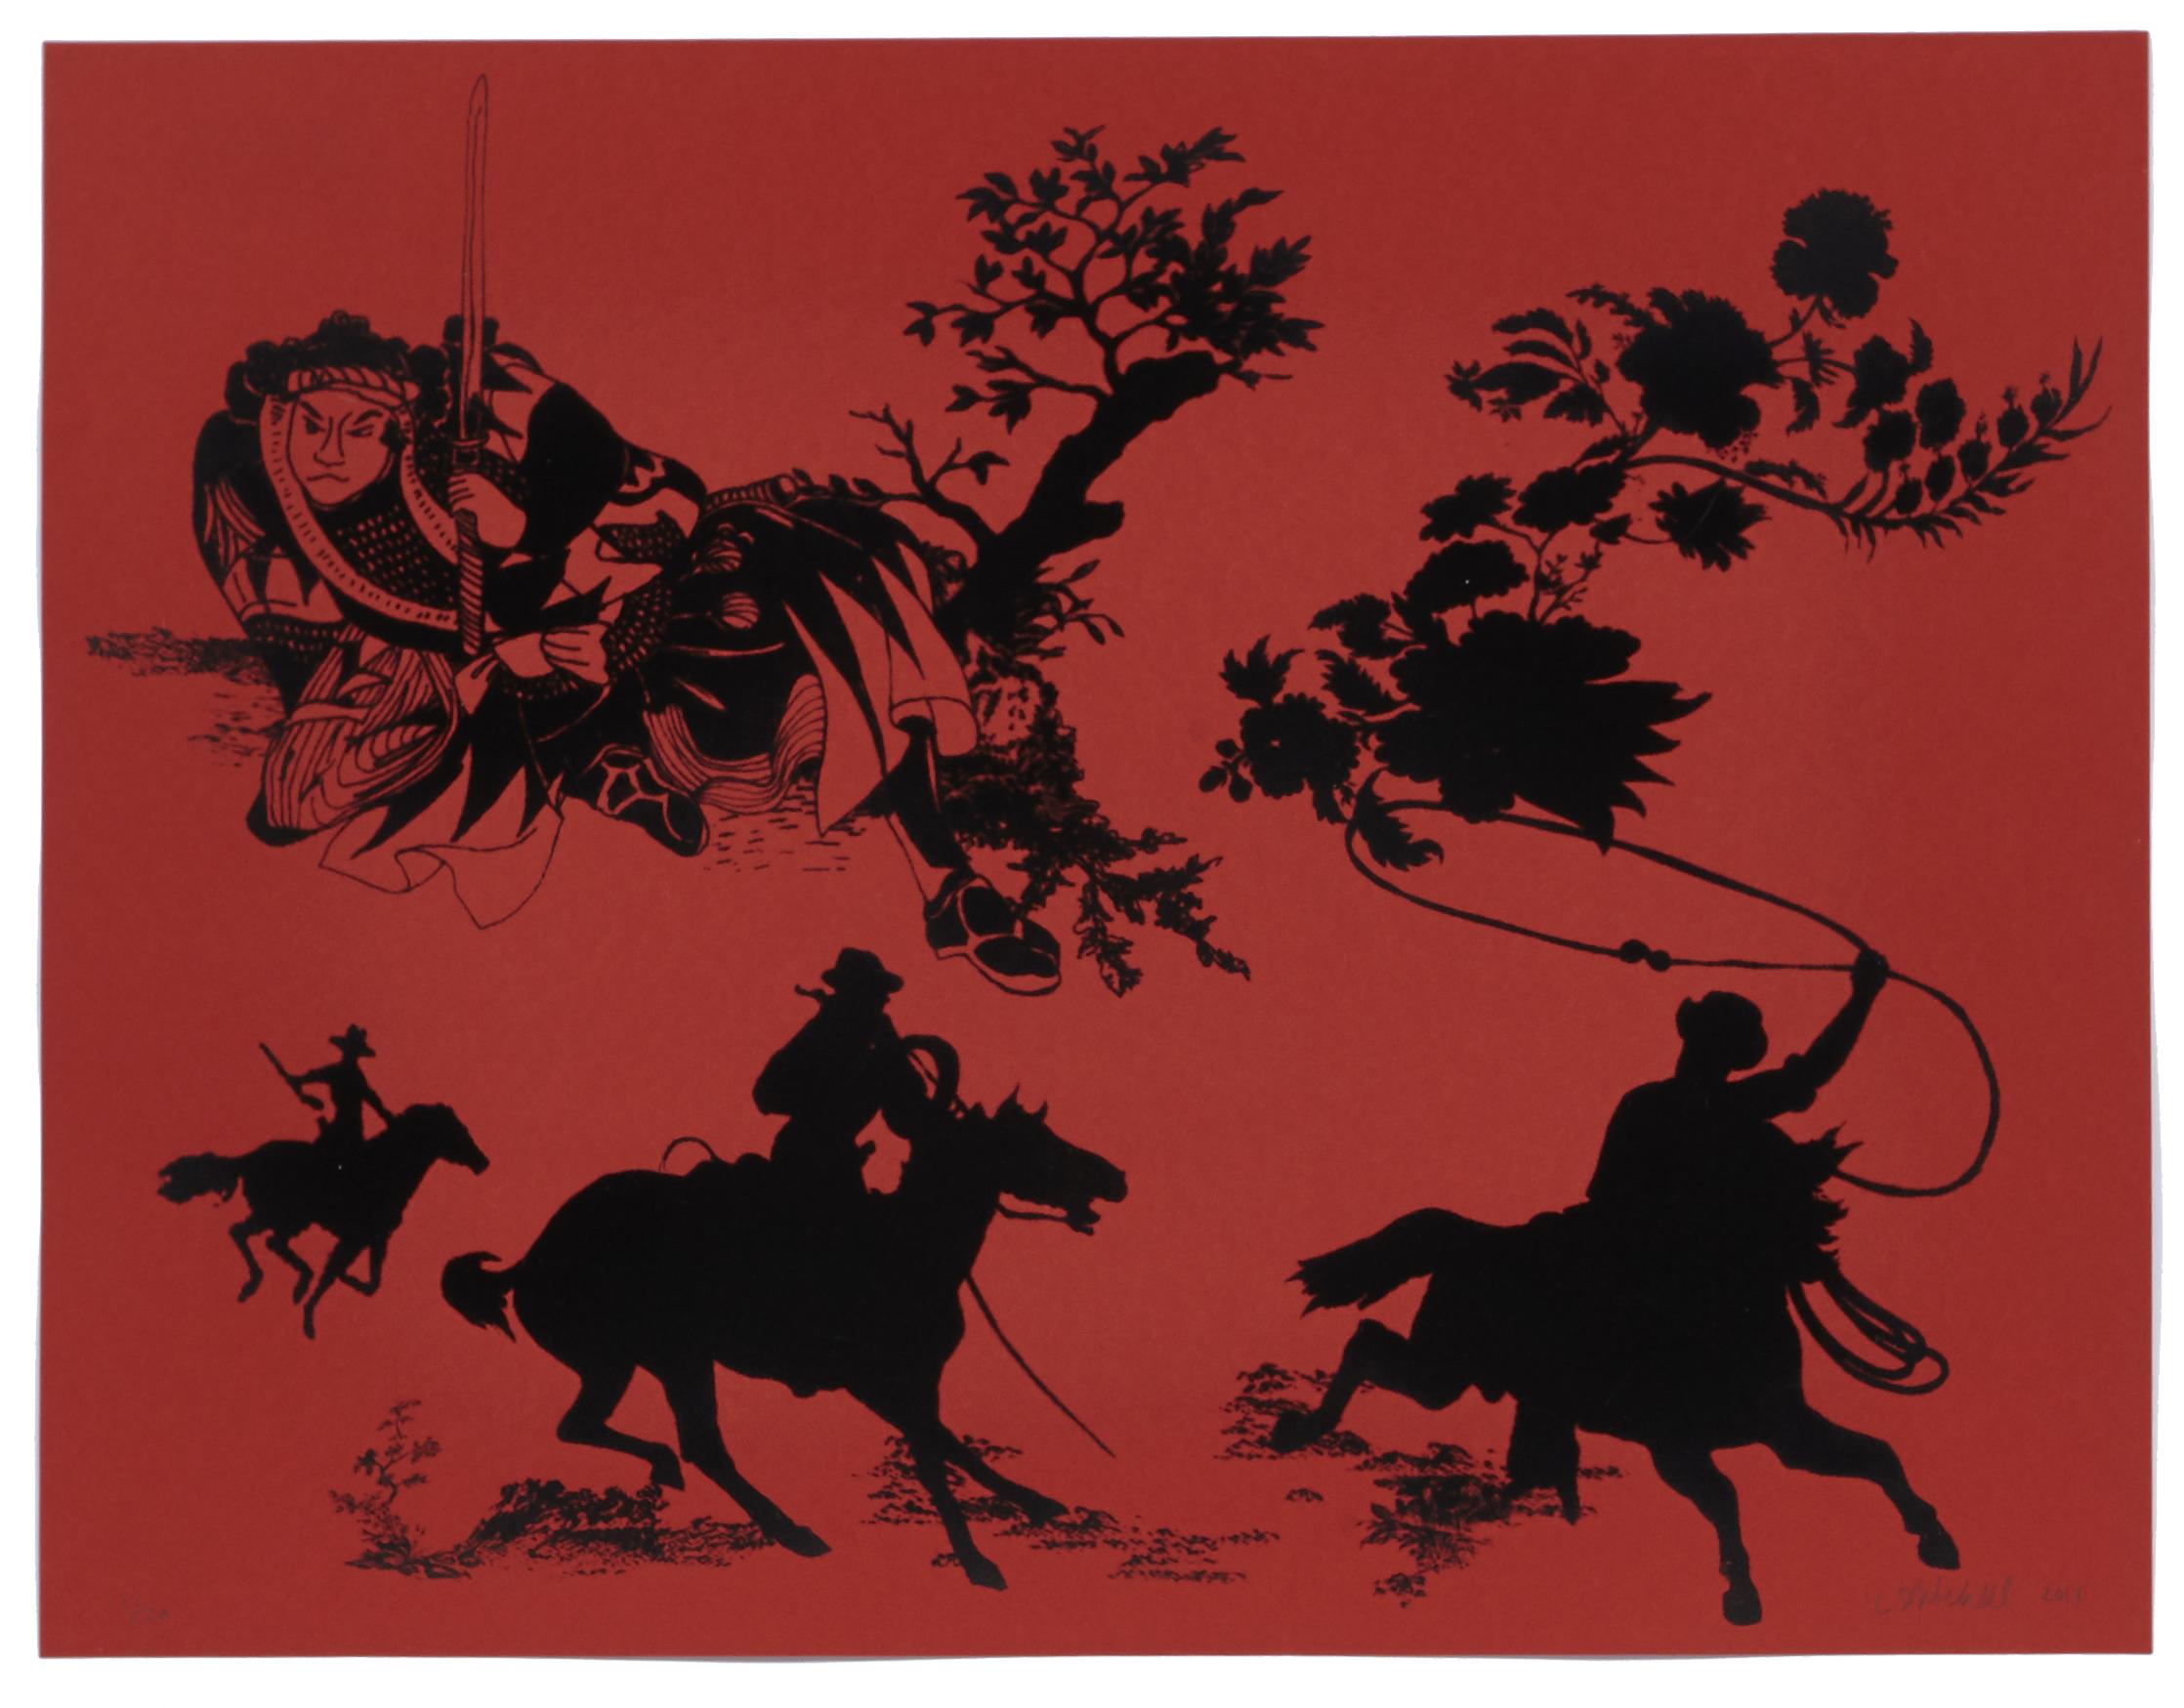 Untitled 1    2012 | 50 x 56 cm | Silkscreen | 20 prints